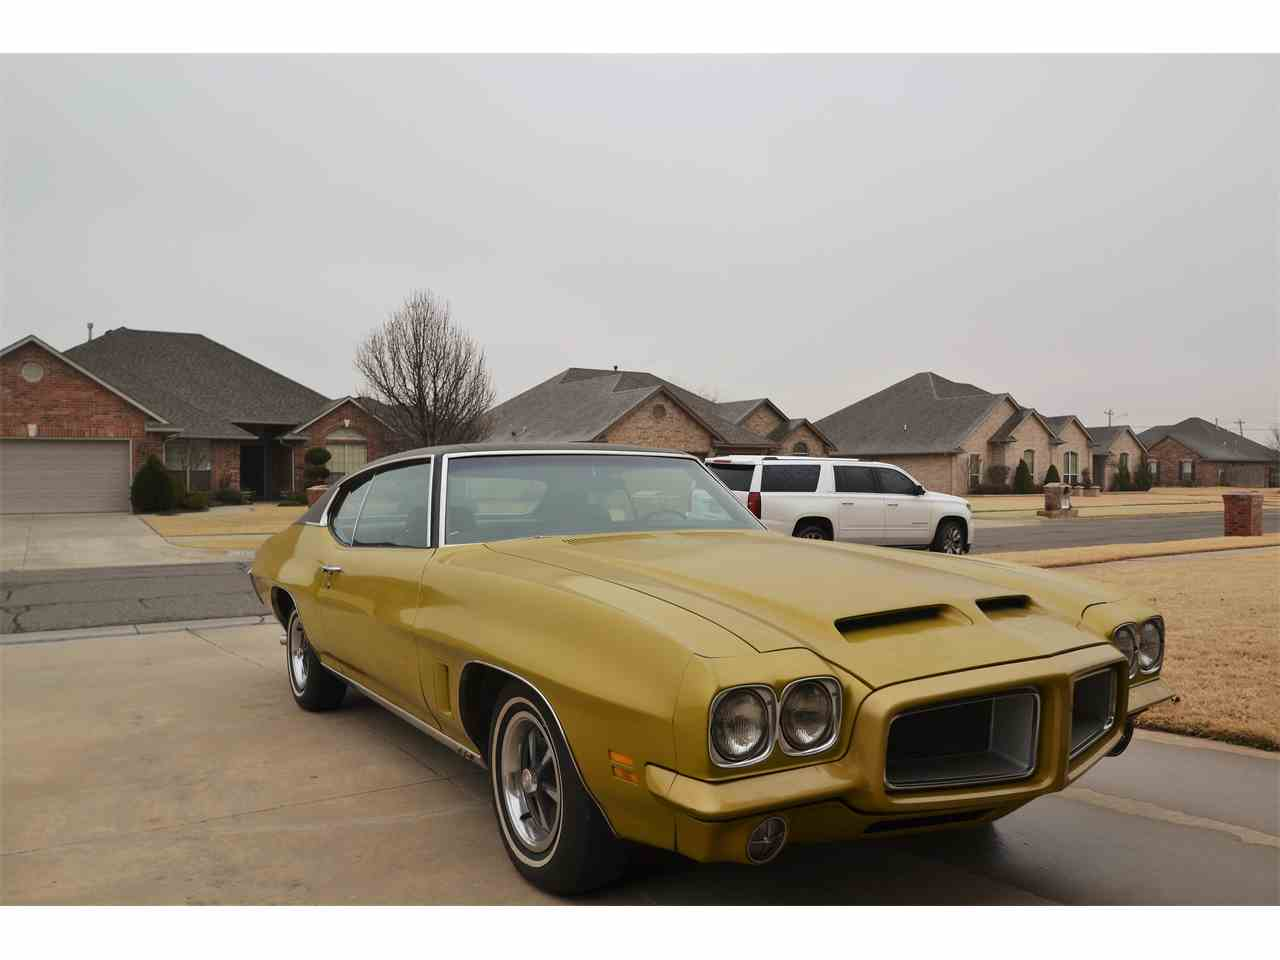 1970 to 1972 Pontiac Lemans for Sale on ClassicCars.com